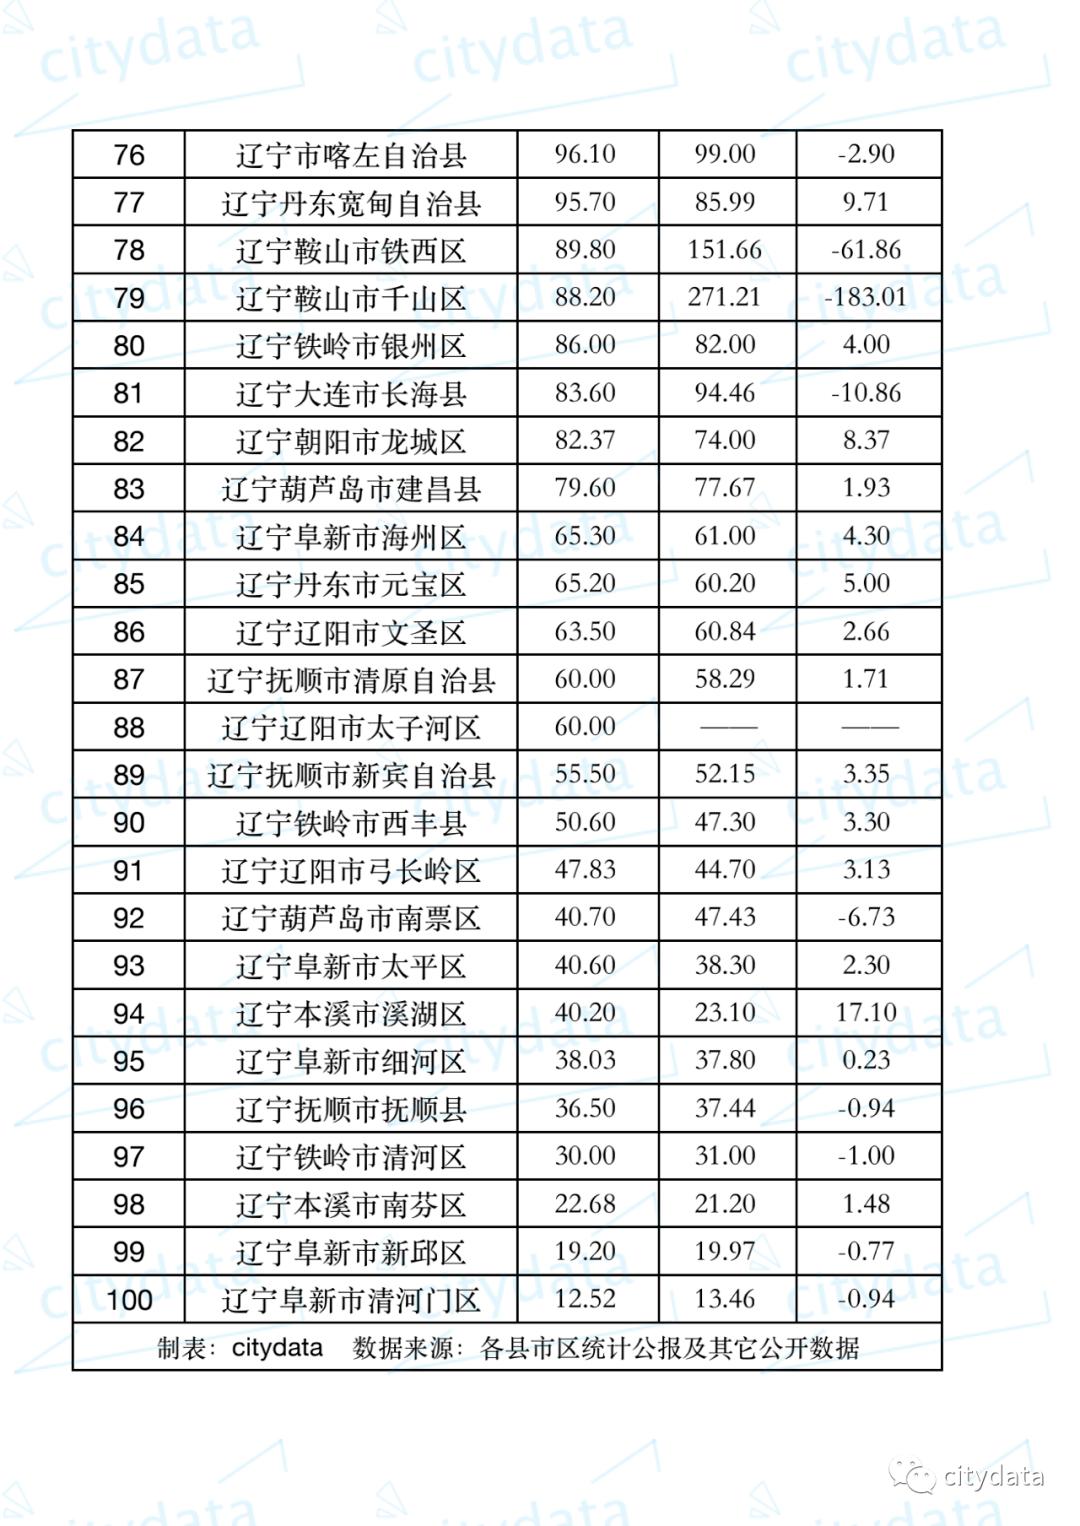 2019gdp_2019年全国文化及相关产业增加值占GDP比重为4.5%